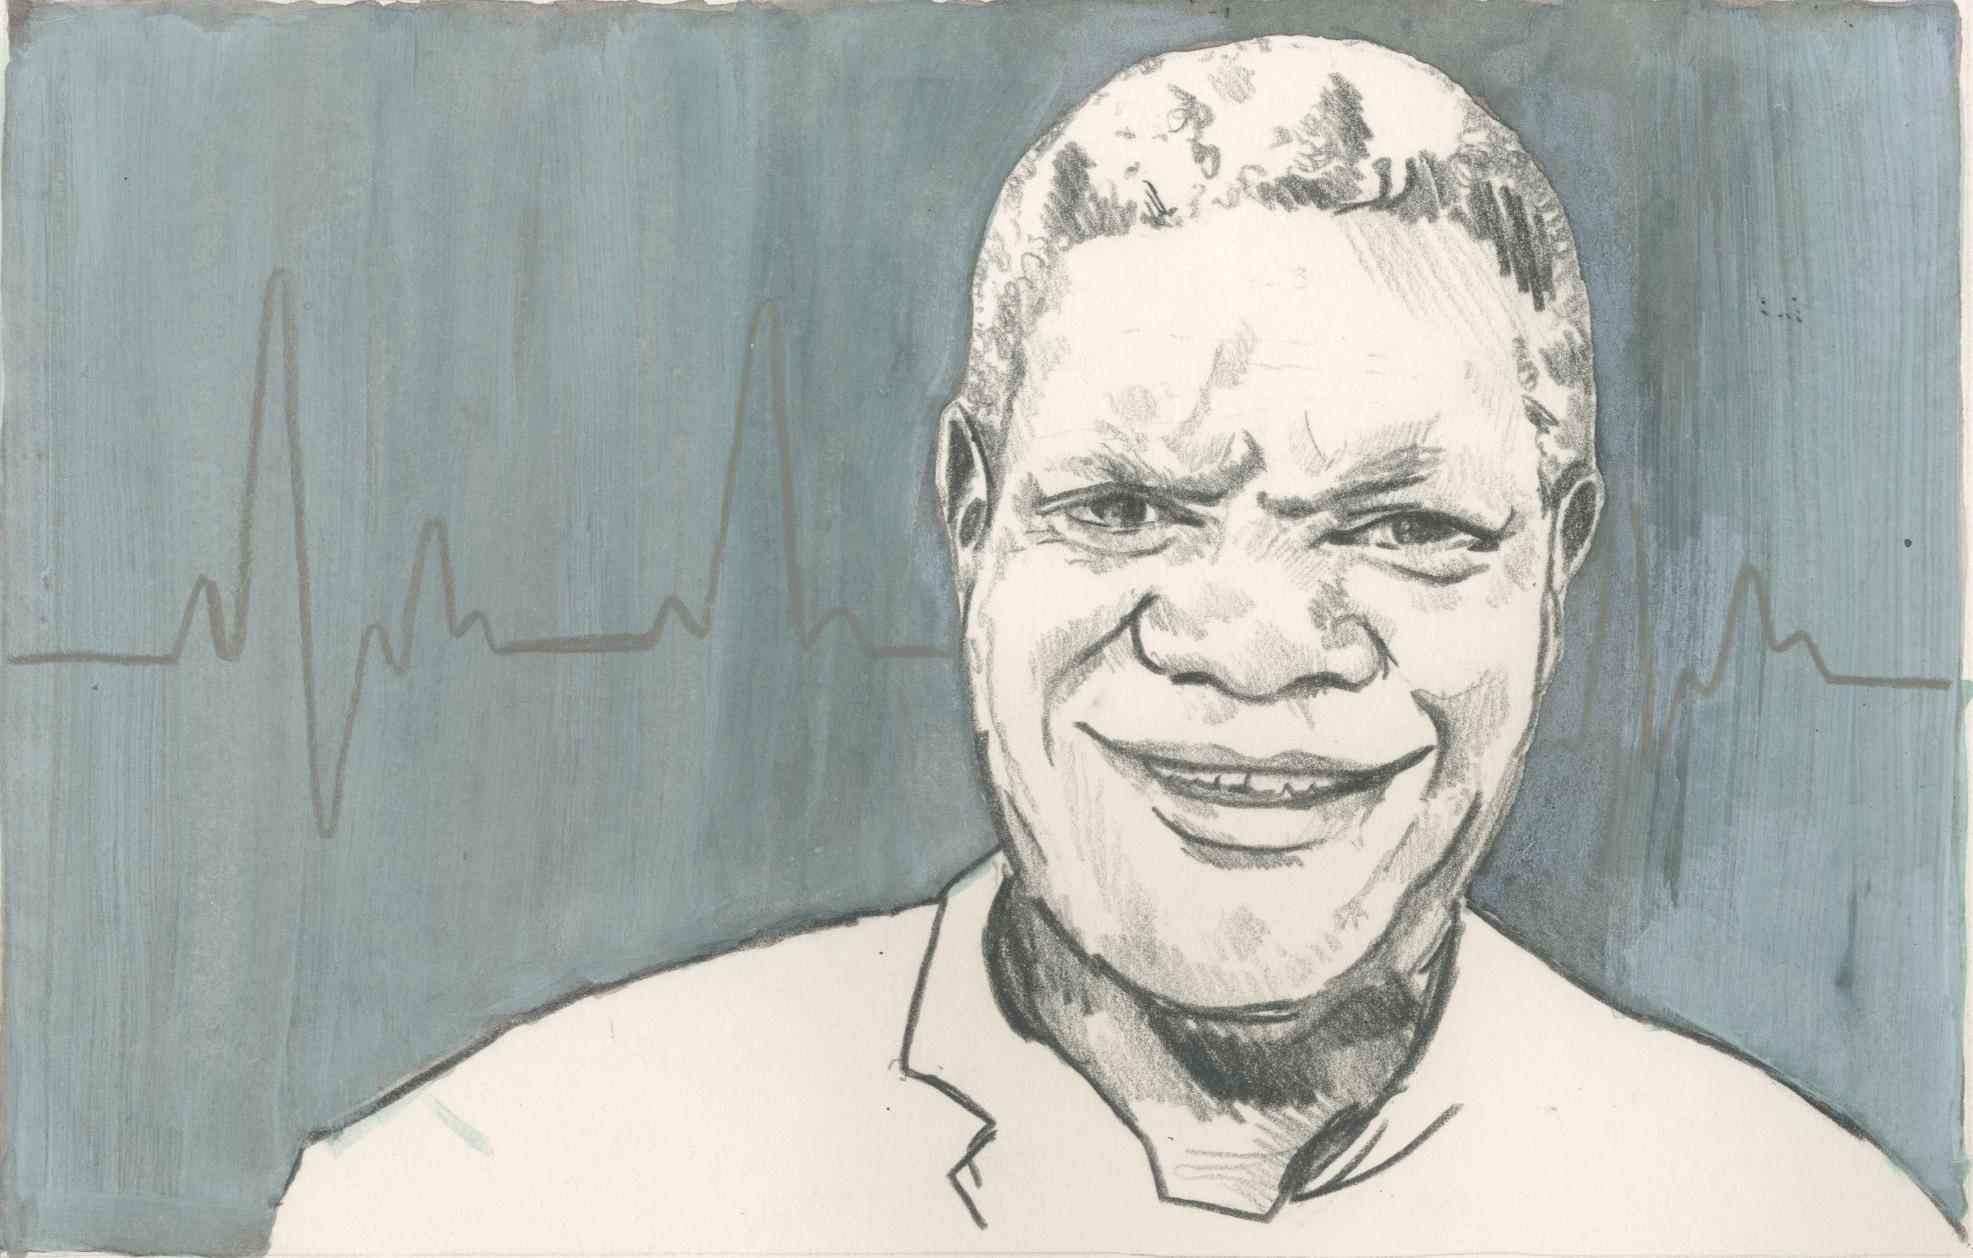 01/01/15 Award-winning gynaecologist Dr Denis Mukwege, whose medical skills save the lives of rape victims. He works at Panzi Hospital, Bukavo, Democratic Republic of Congo